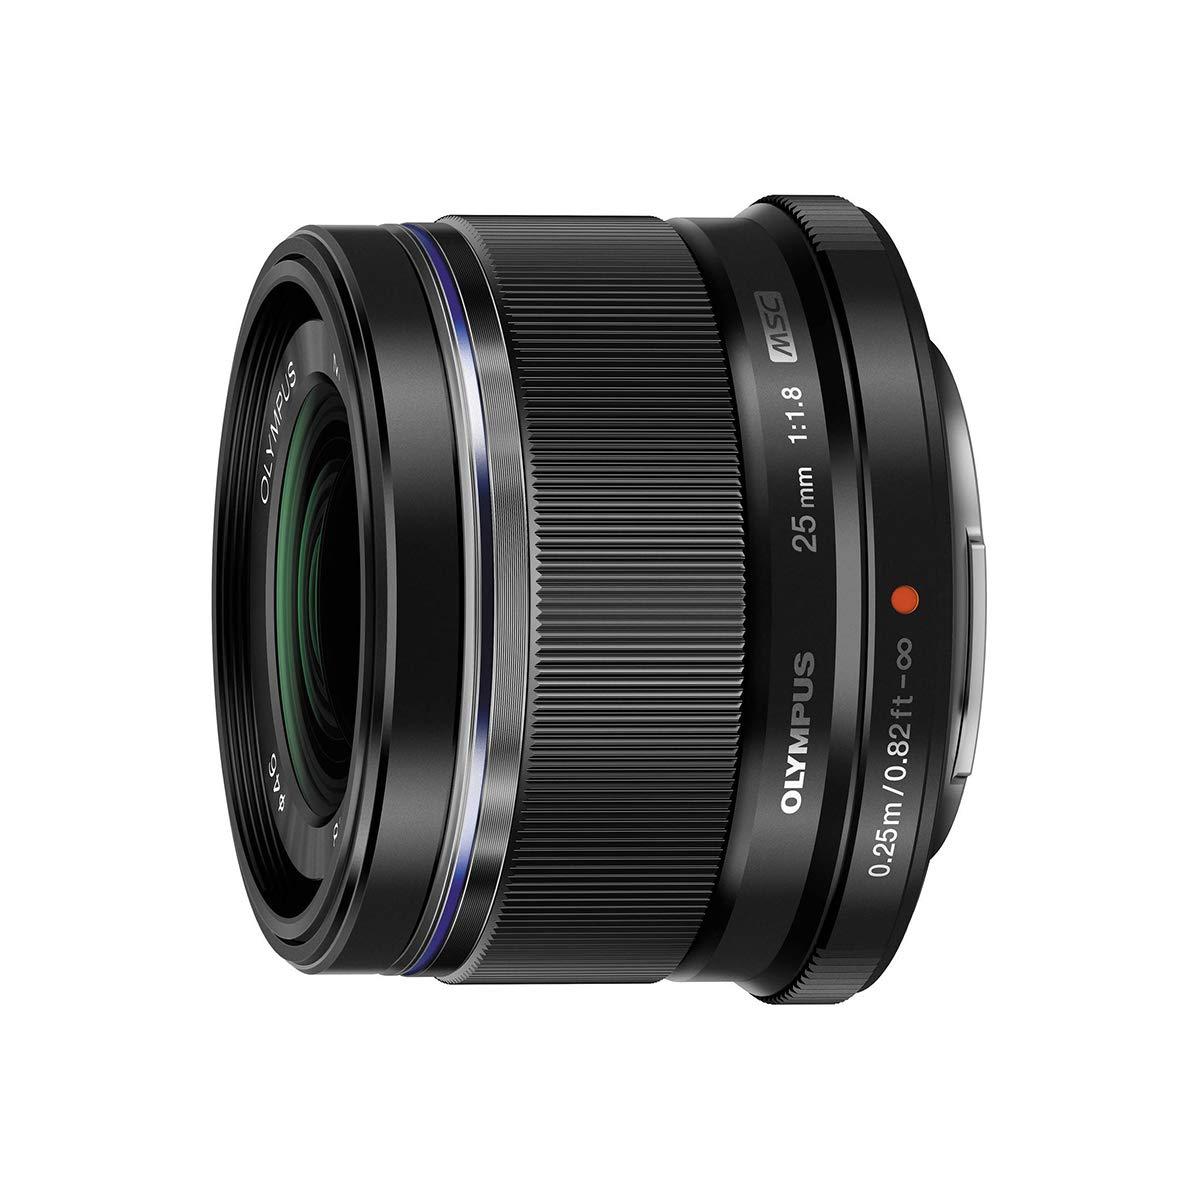 Olympus M.Zuiko Digital 25mm F1.8 Lens, for Micro Four Thirds Cameras (Black) by Olympus